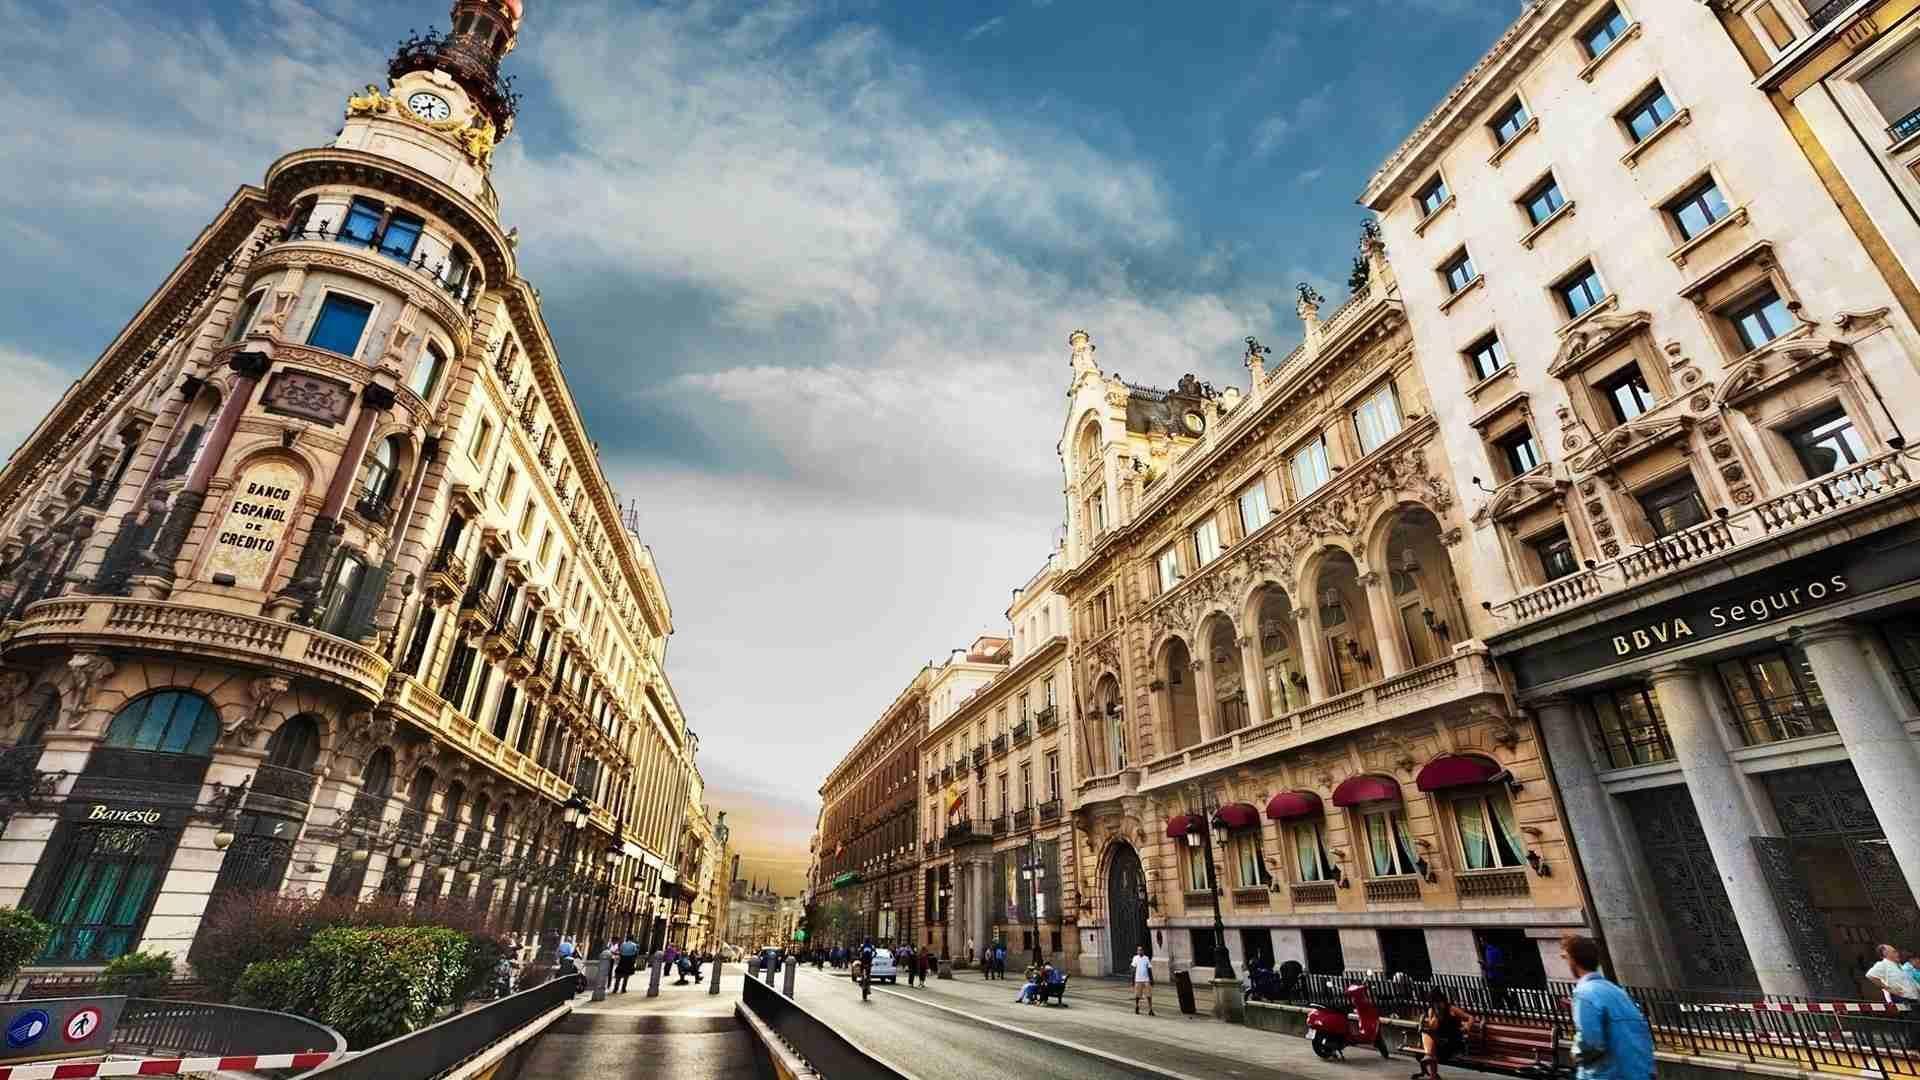 Barcelona city wallpapers | Barcelona cidade, Papel de parede da ...